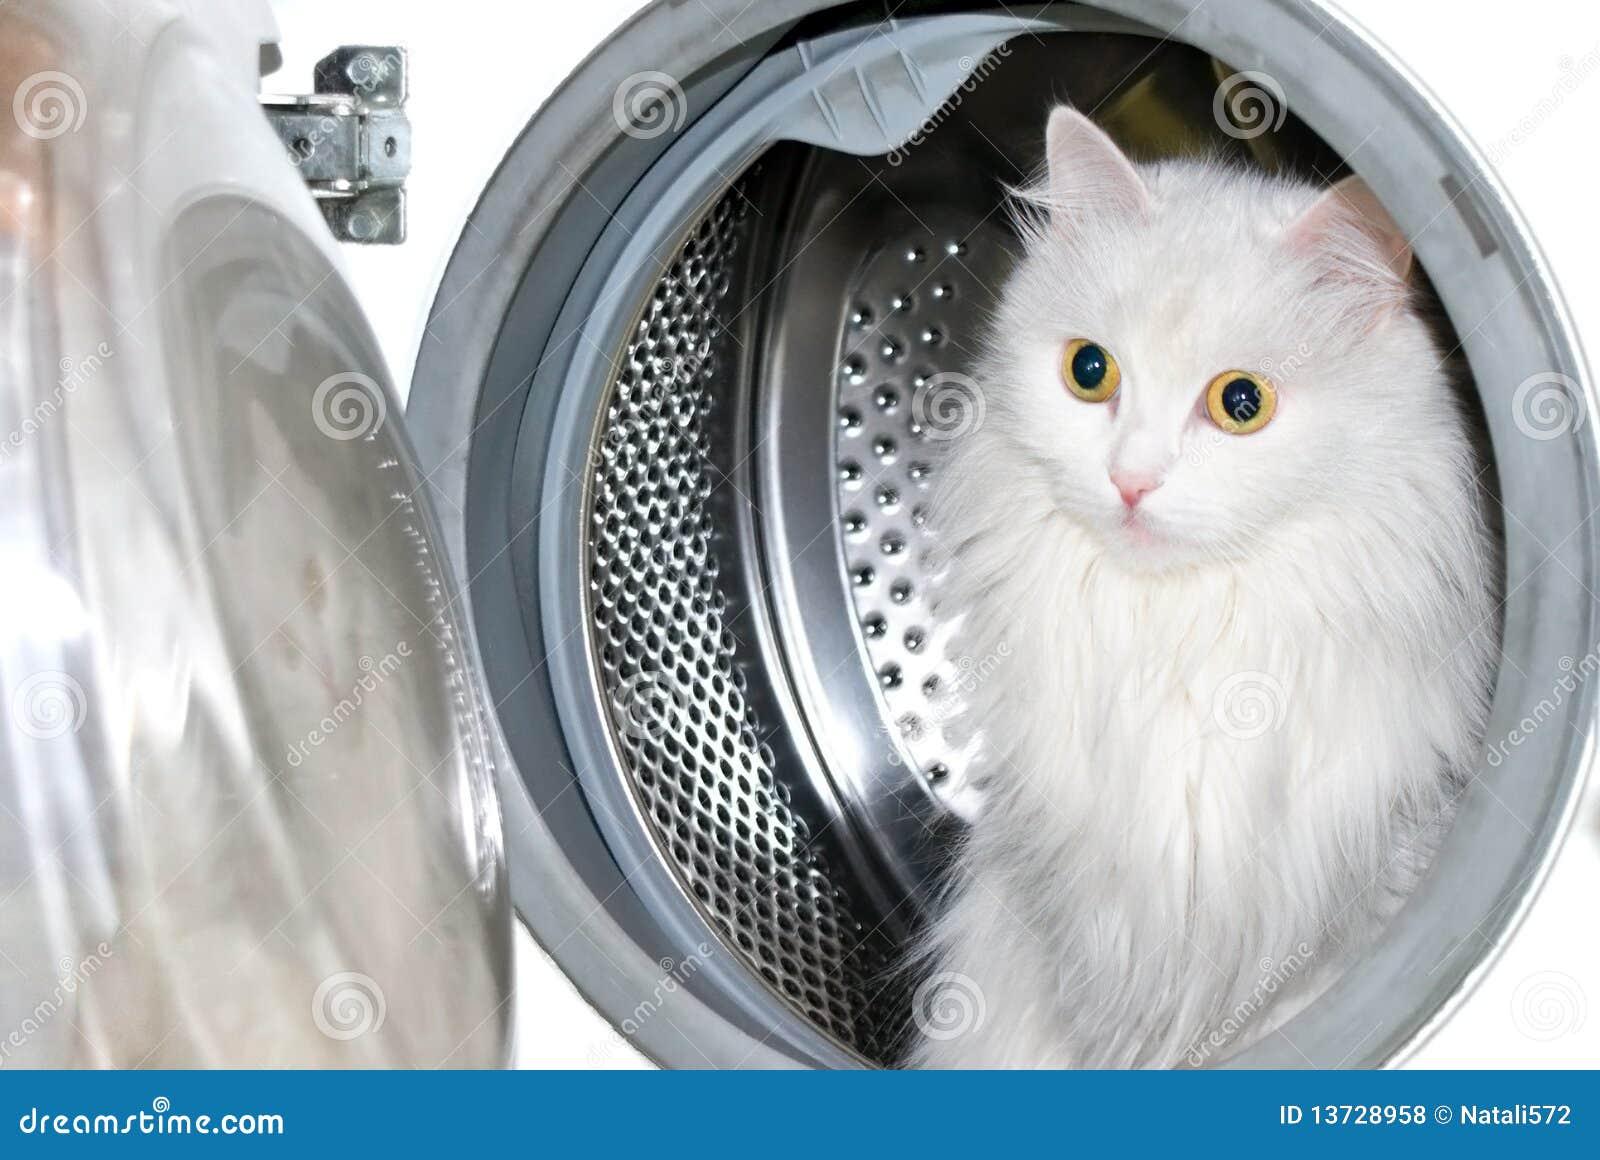 pet washing machine cat